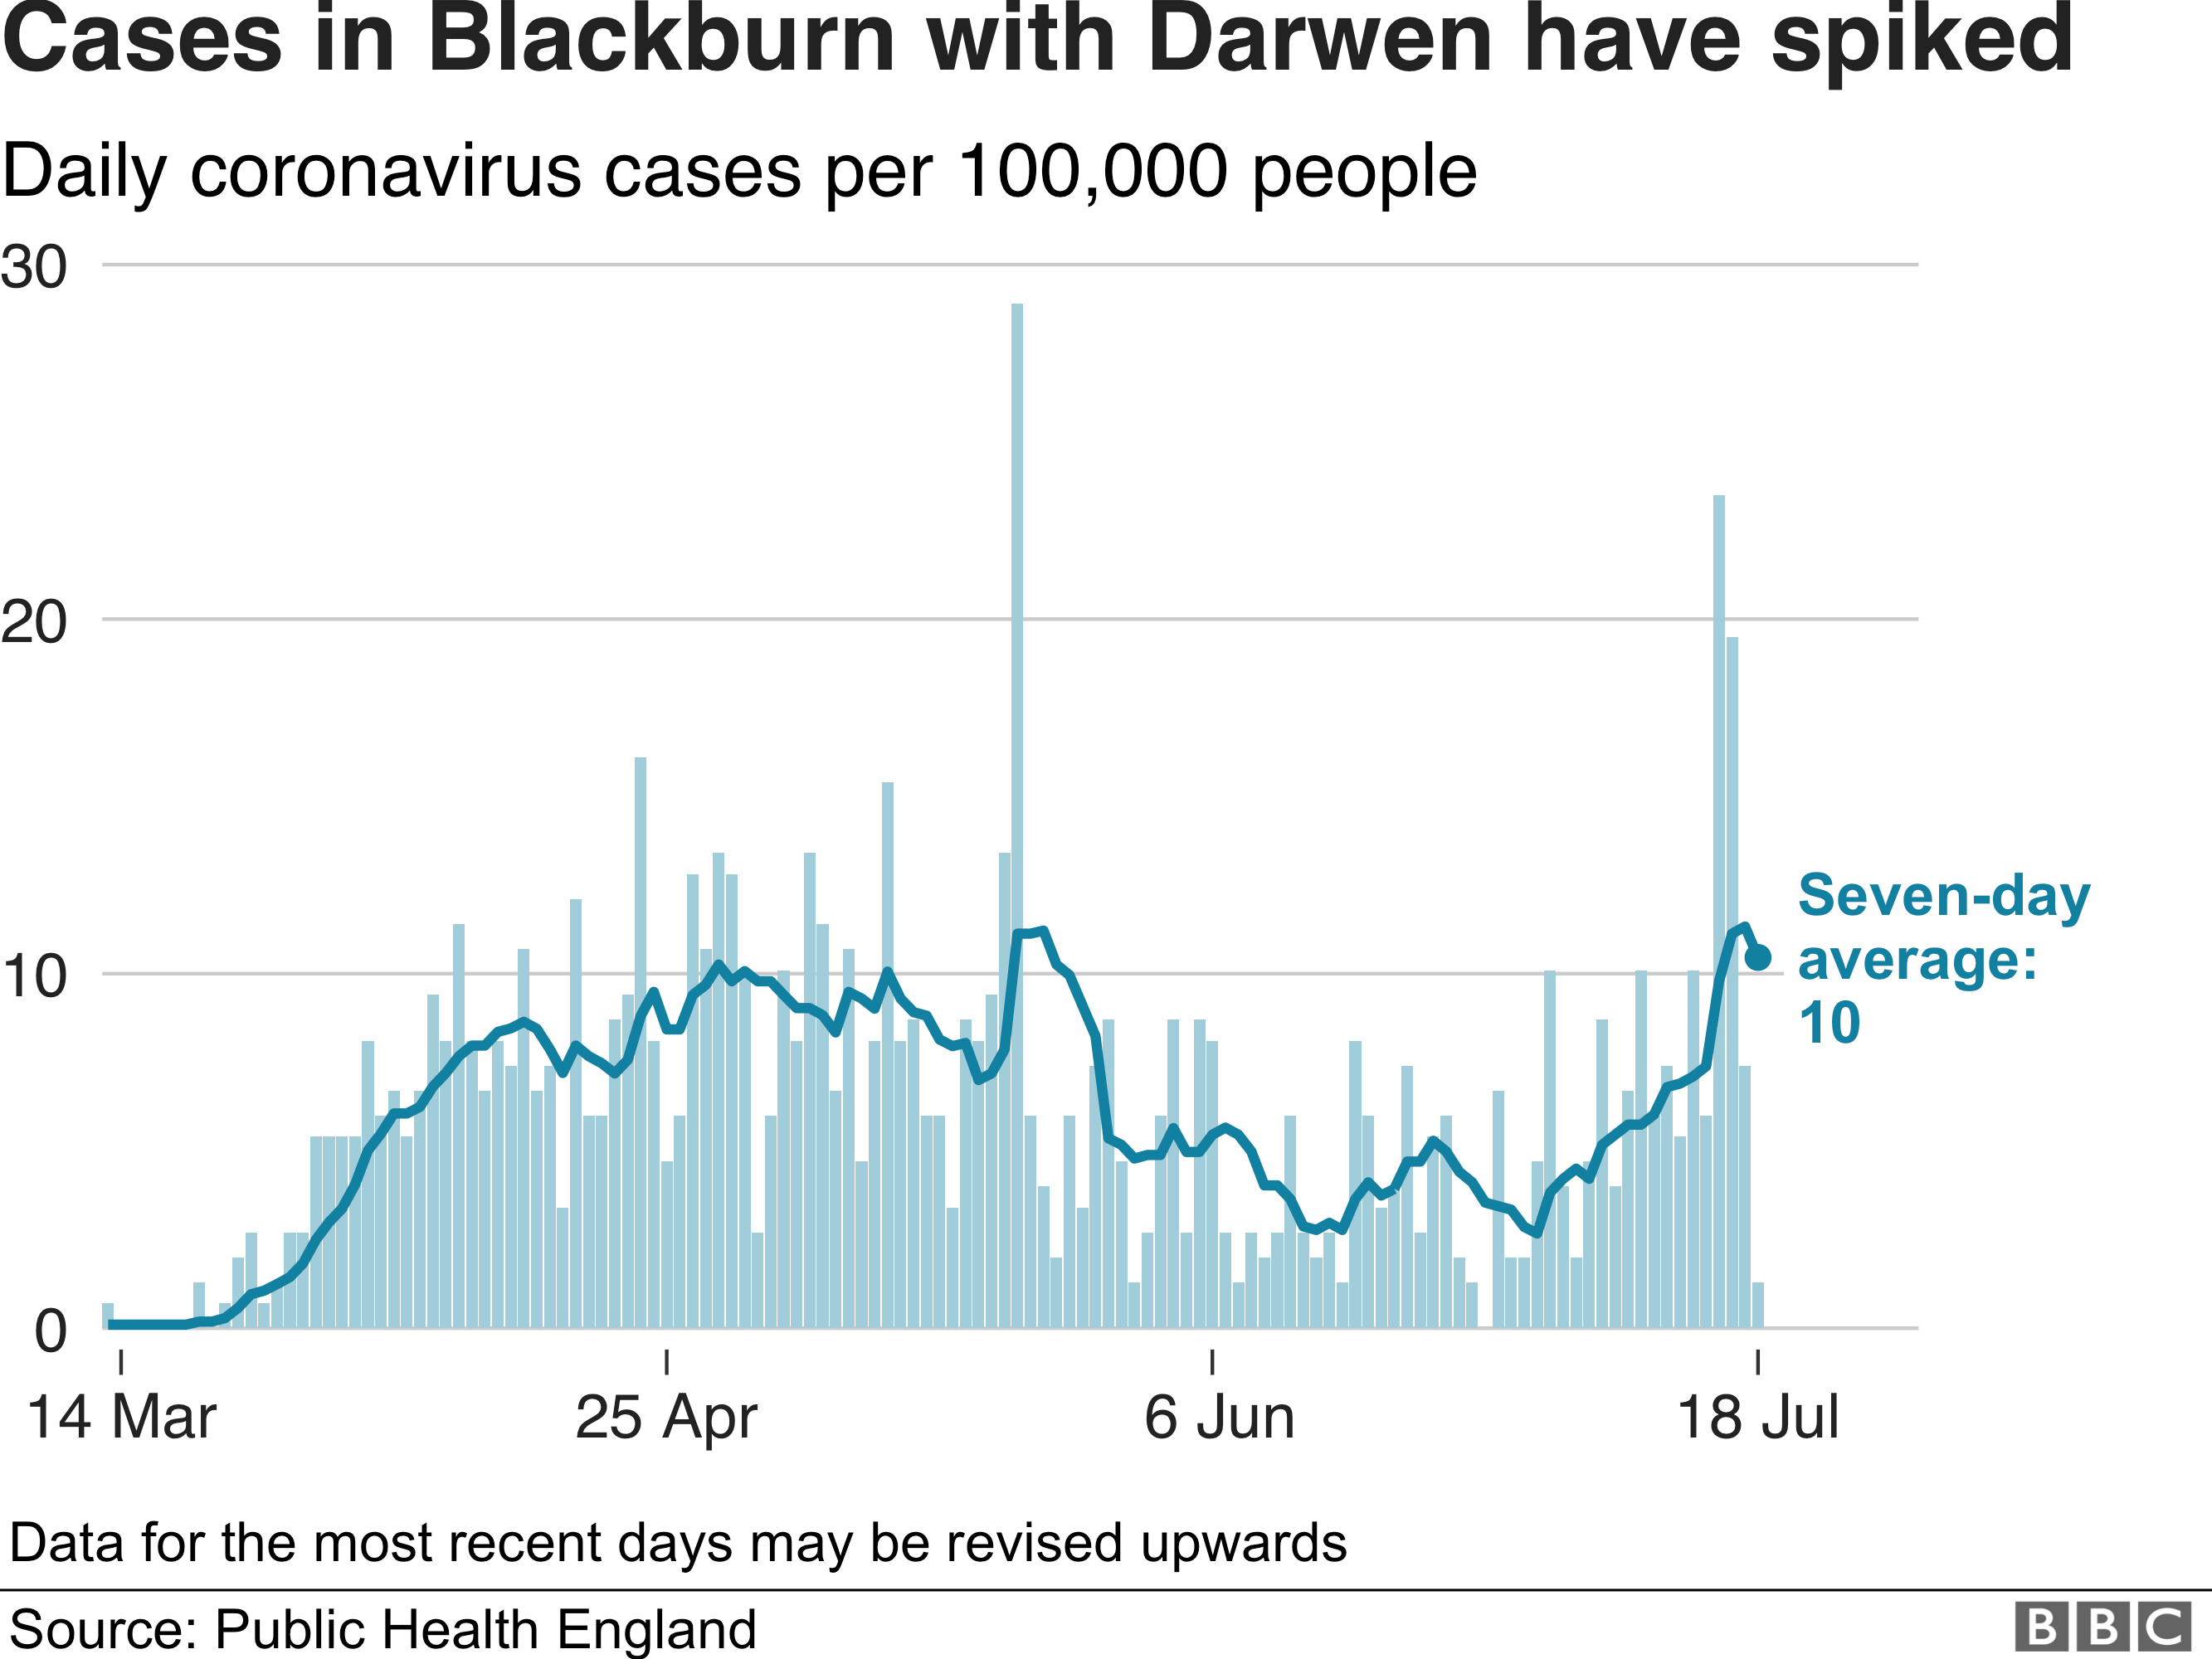 Graphic showing coronavirus cases in Blackburn